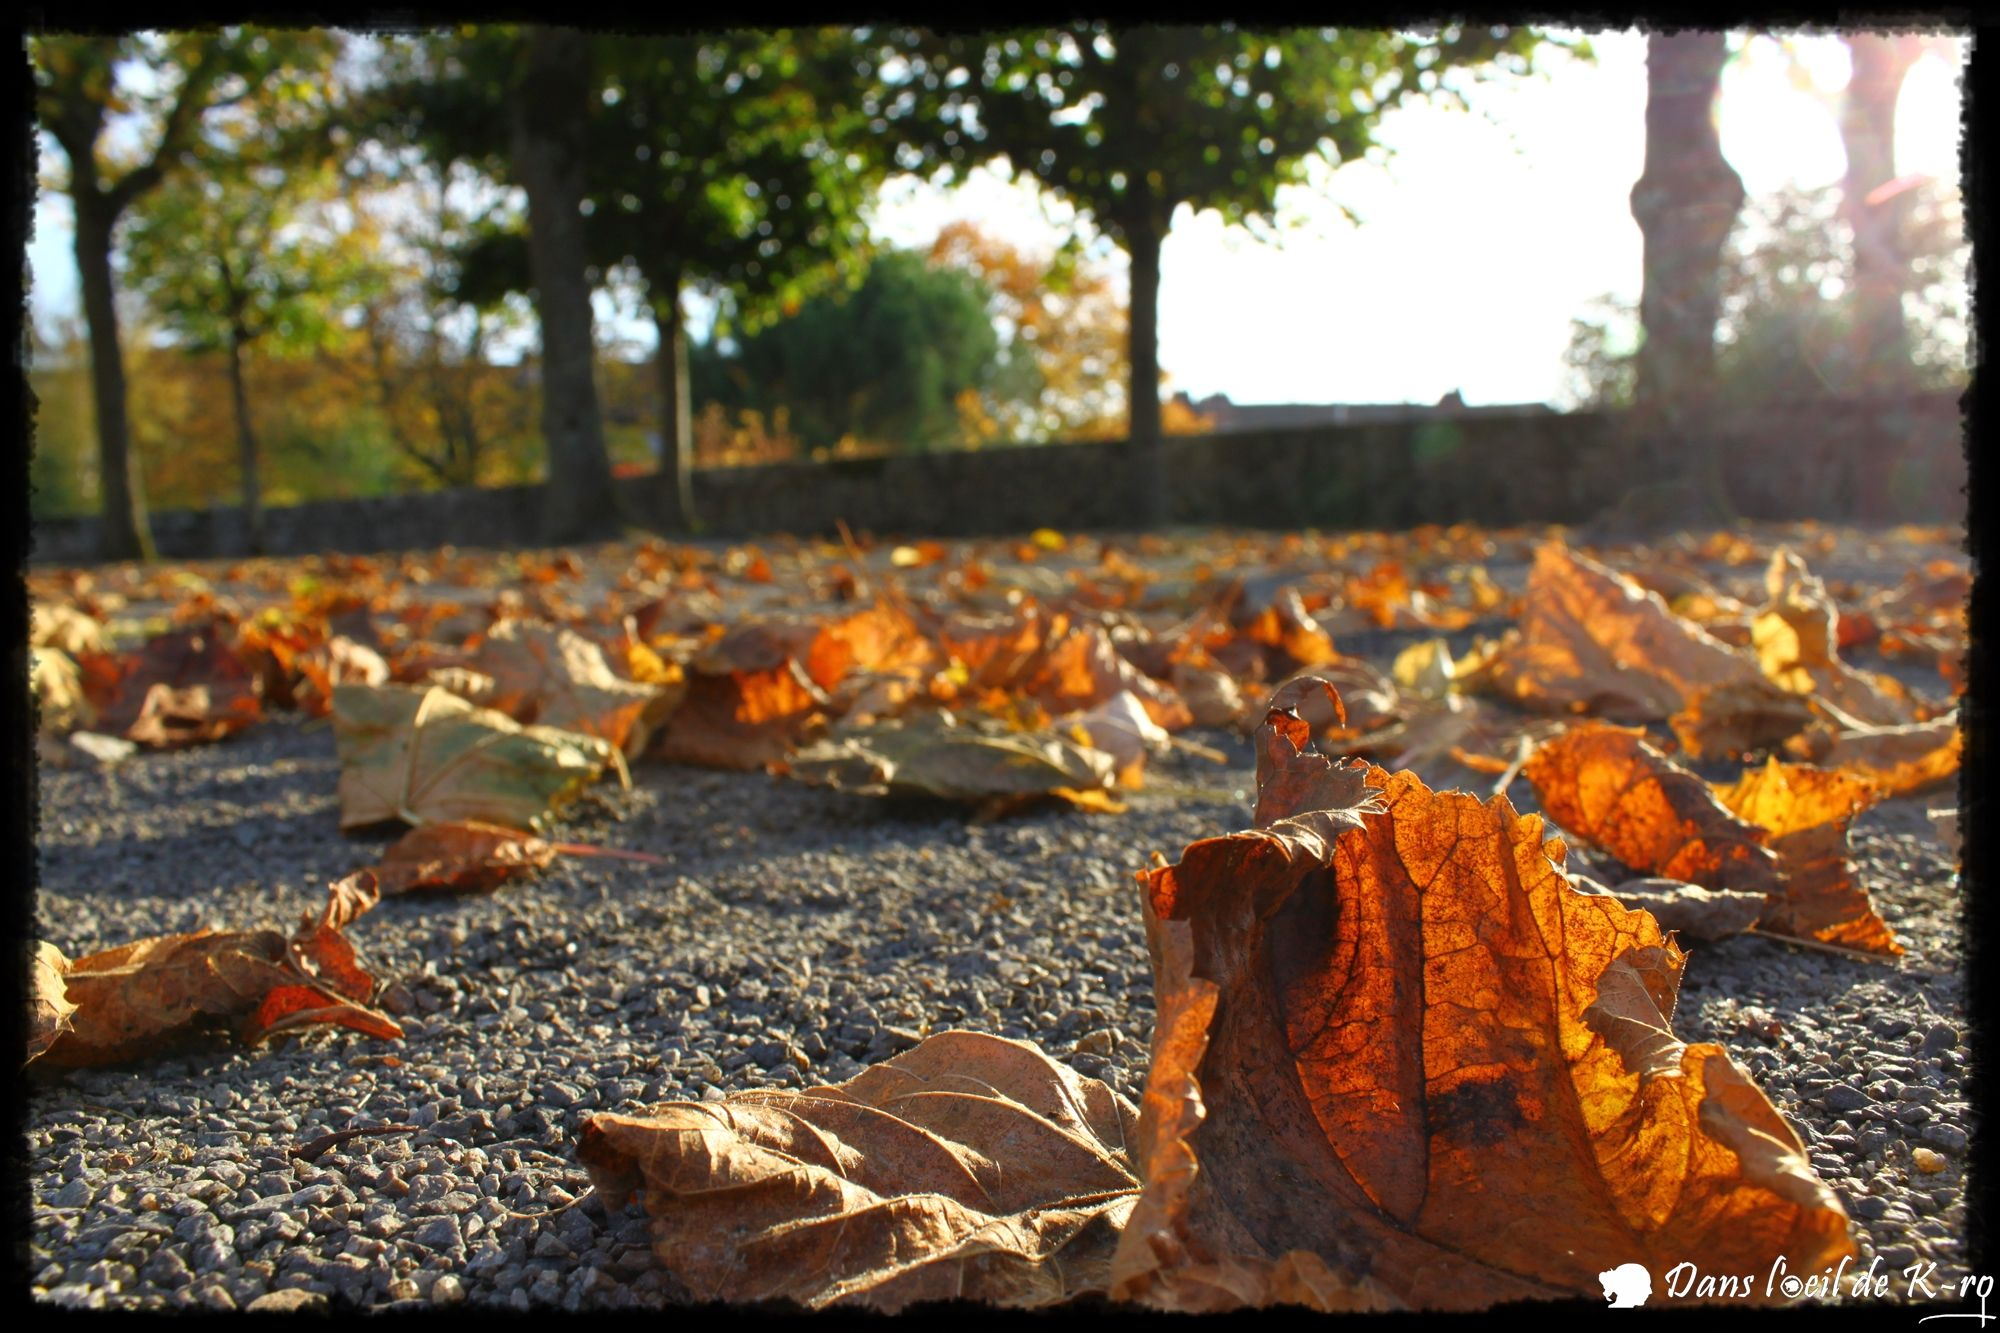 automne autumn feuilles leaves soleil sun dansloeildekro